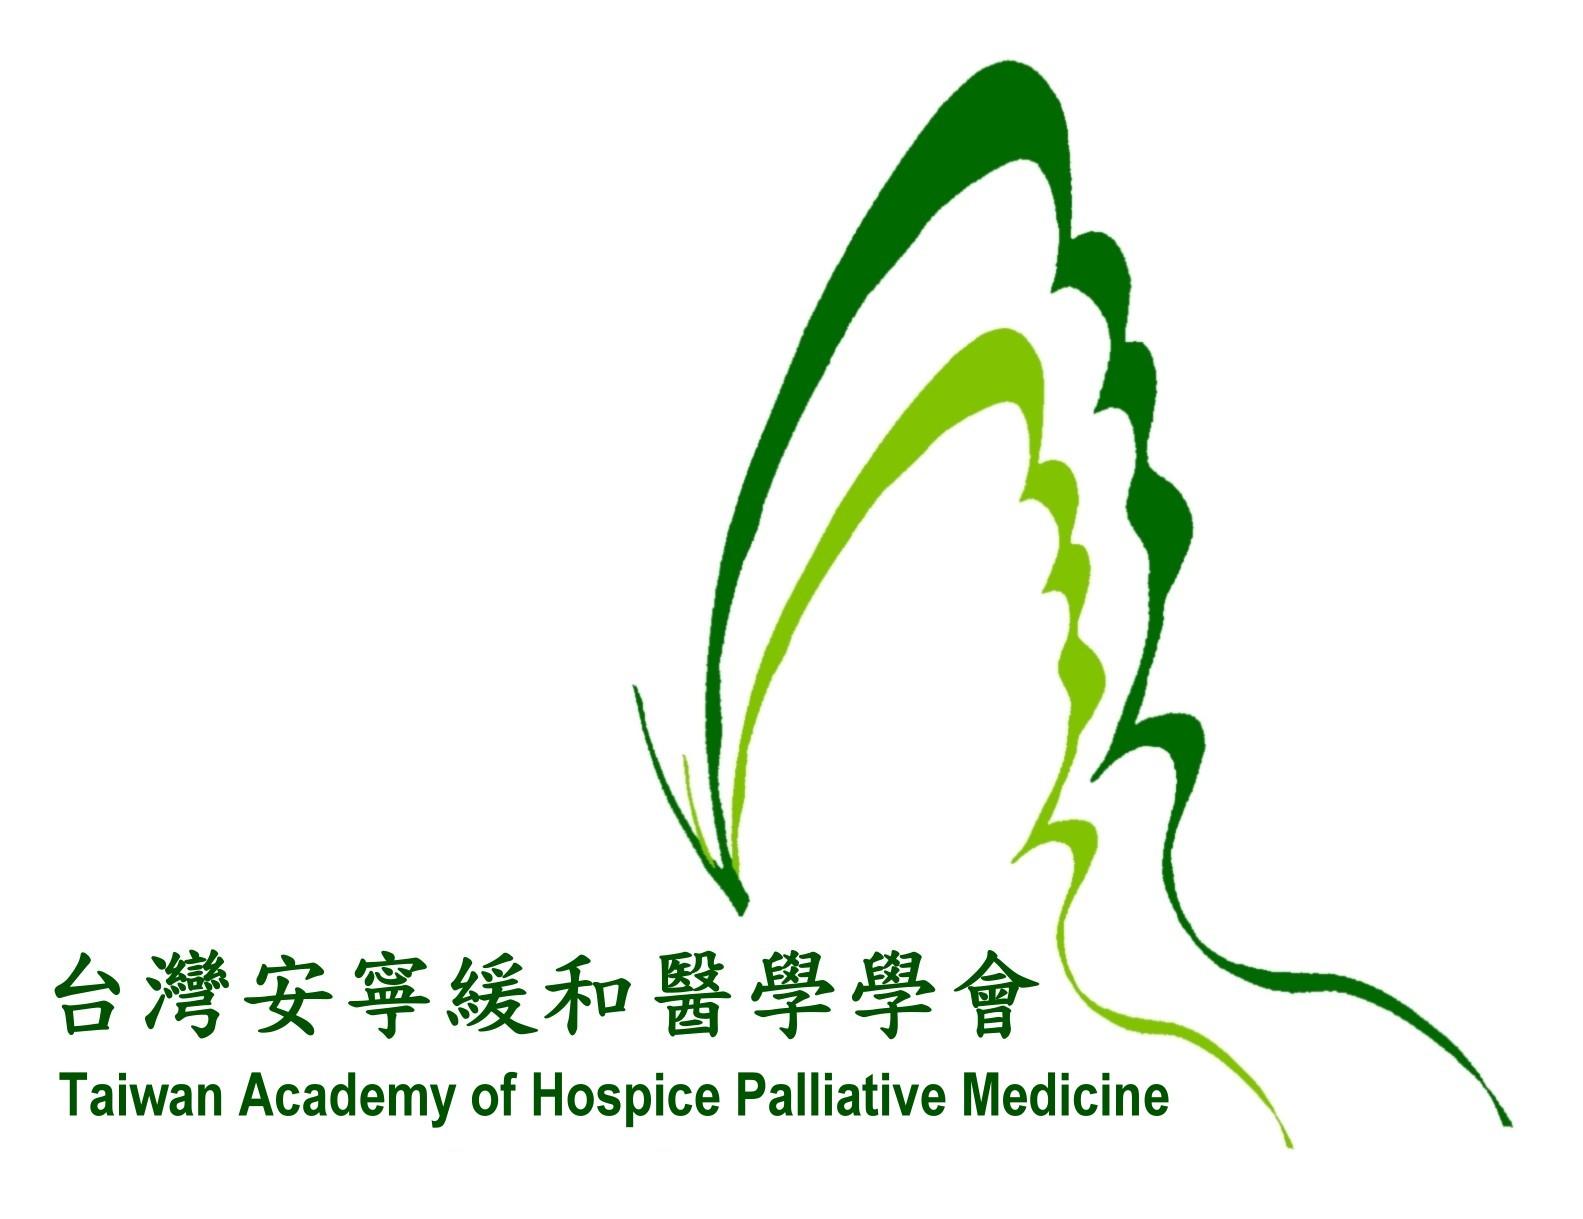 Taiwan Academy of Hospice Palliative Medicine